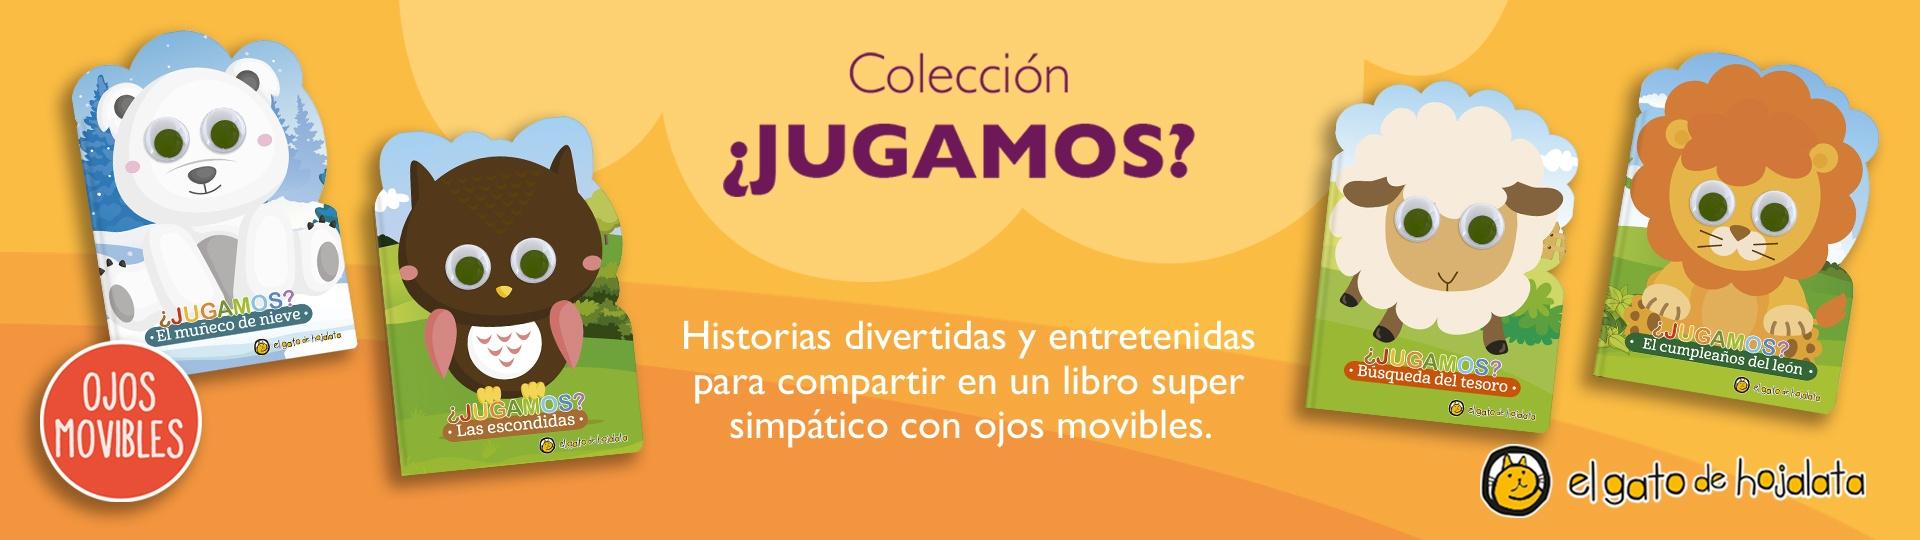 JUGAMOS_WEB_1920x540